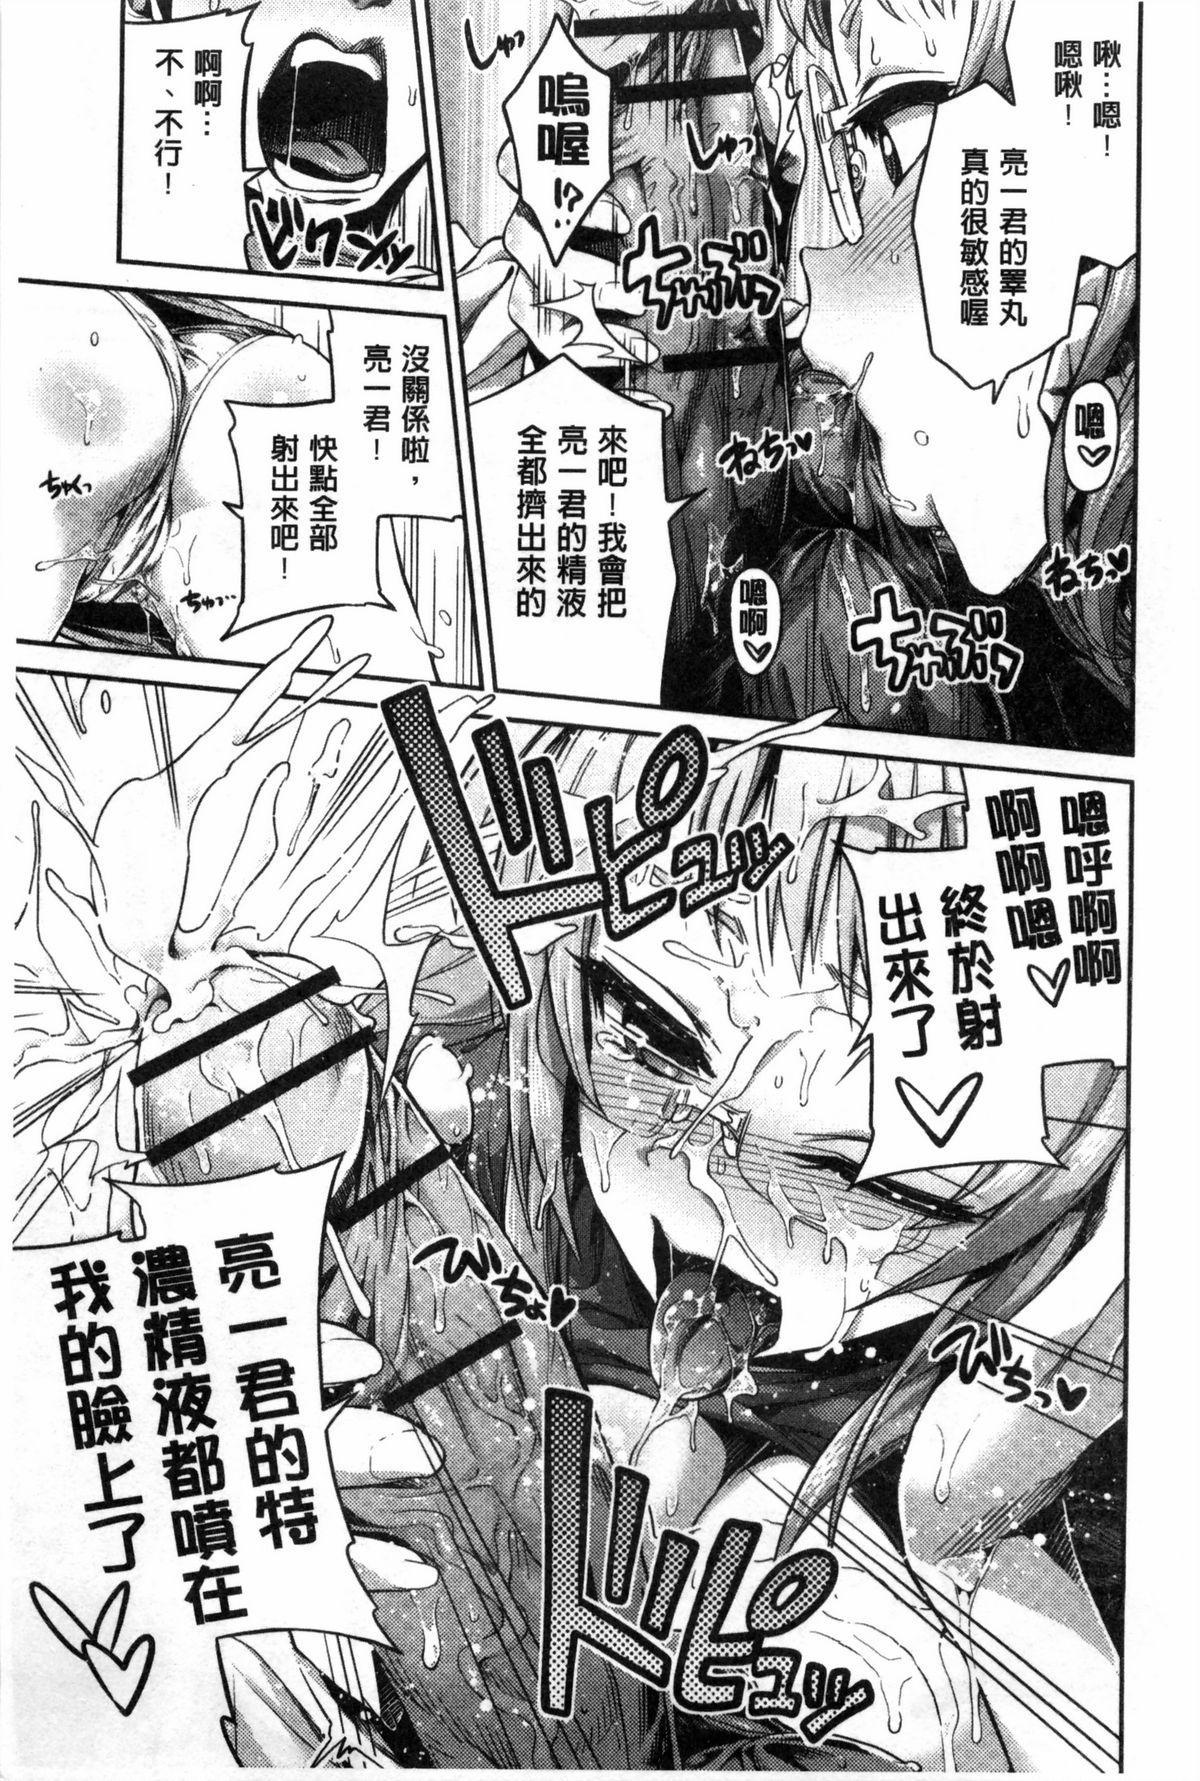 Man x Koi - Ero Manga de Hajimaru Koi no Plot   A漫×戀情 由情色漫畫所萌生的戀之物語 37